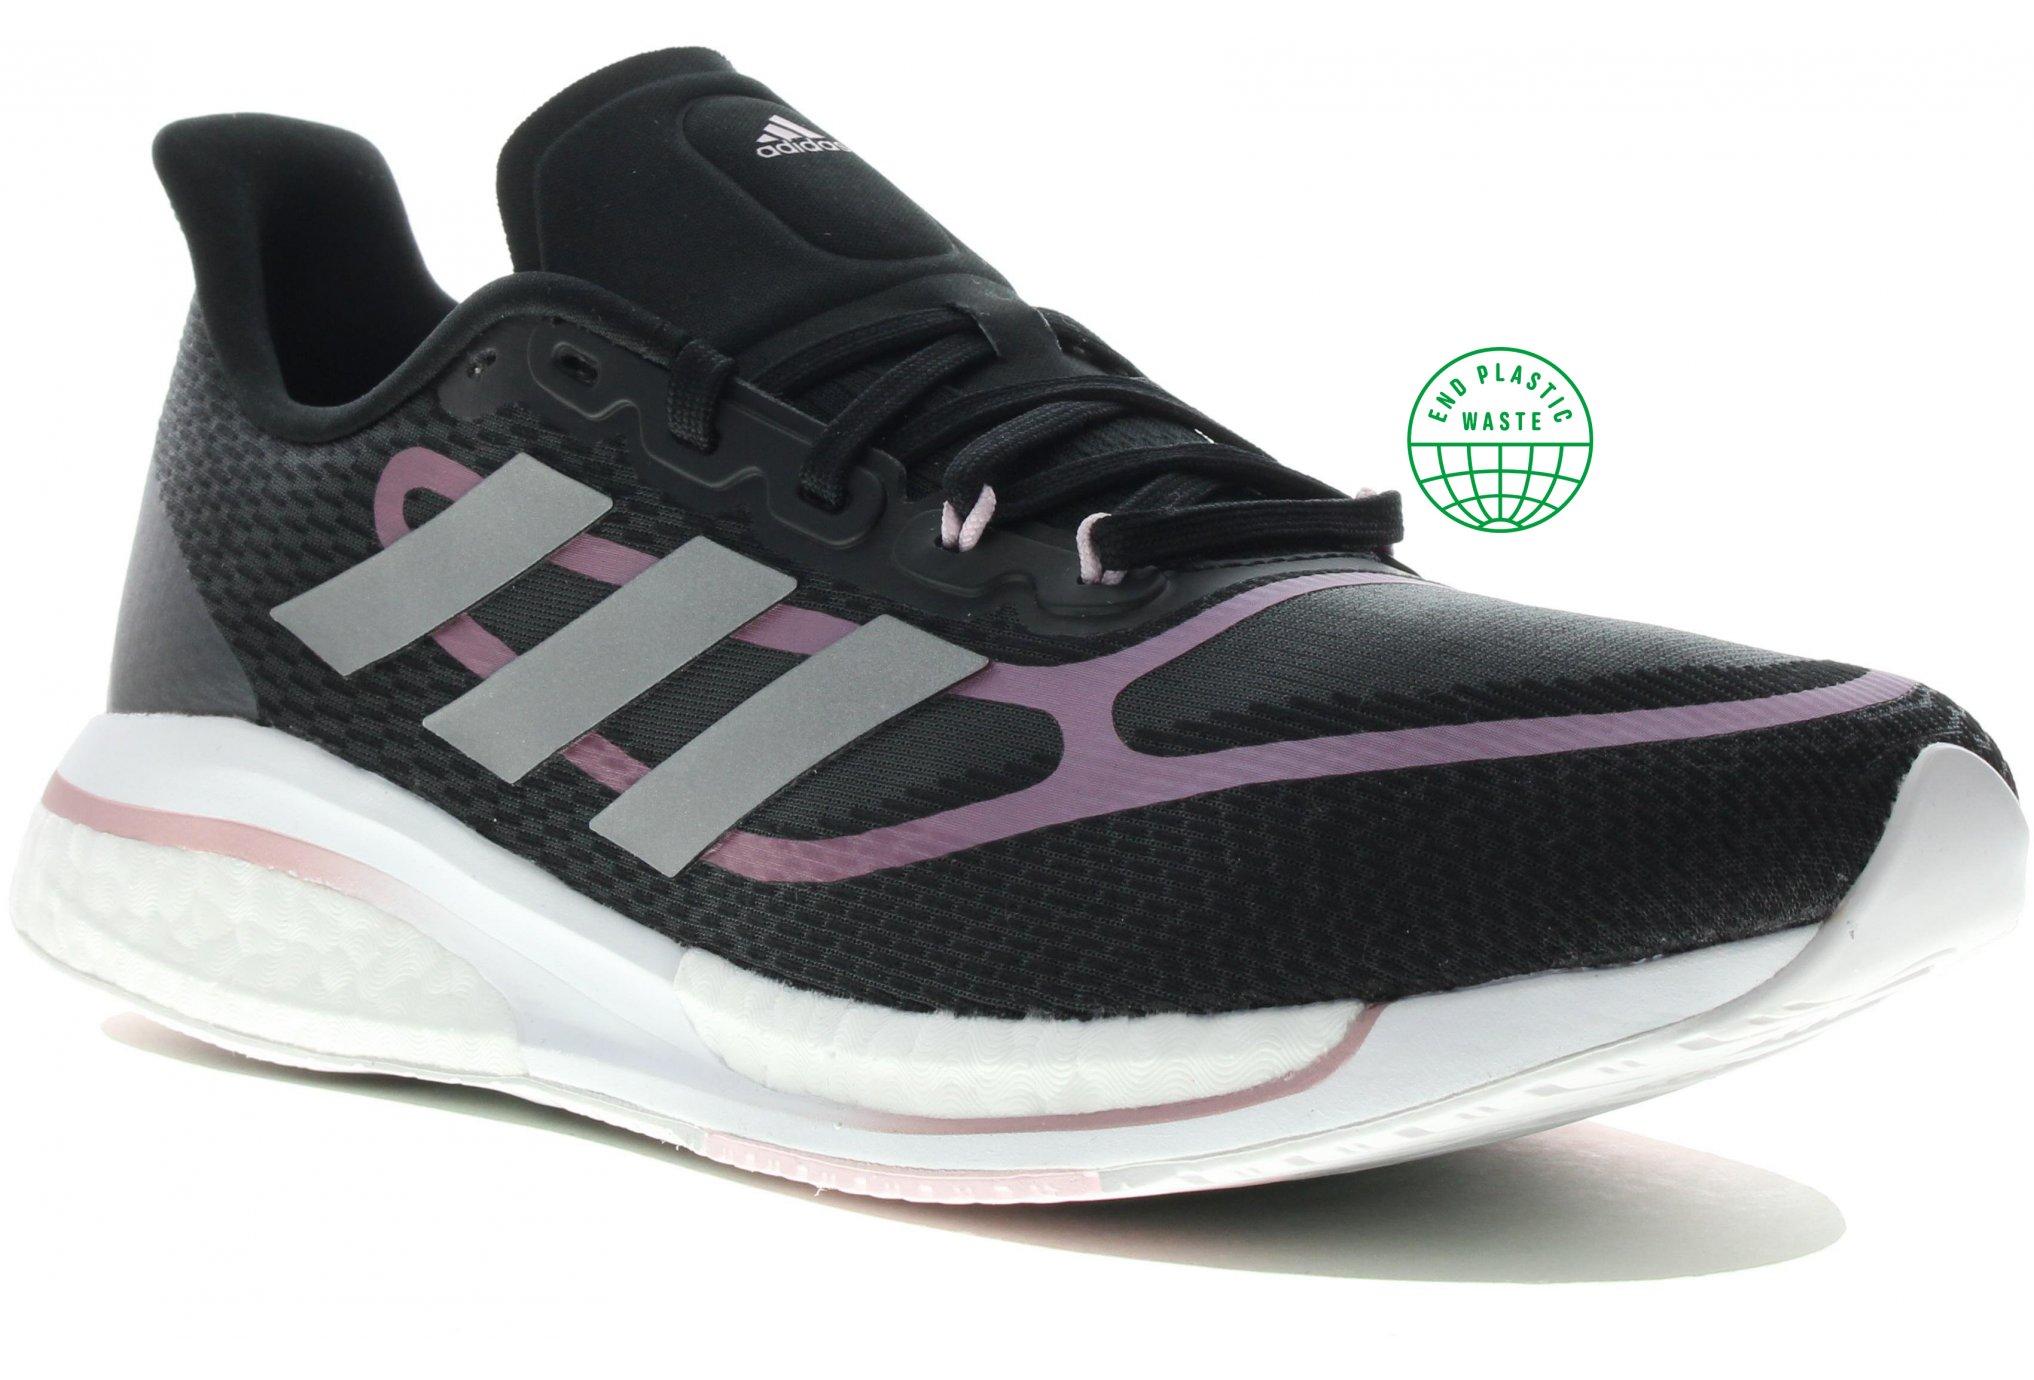 adidas Supernova+ Primegreen W Chaussures running femme